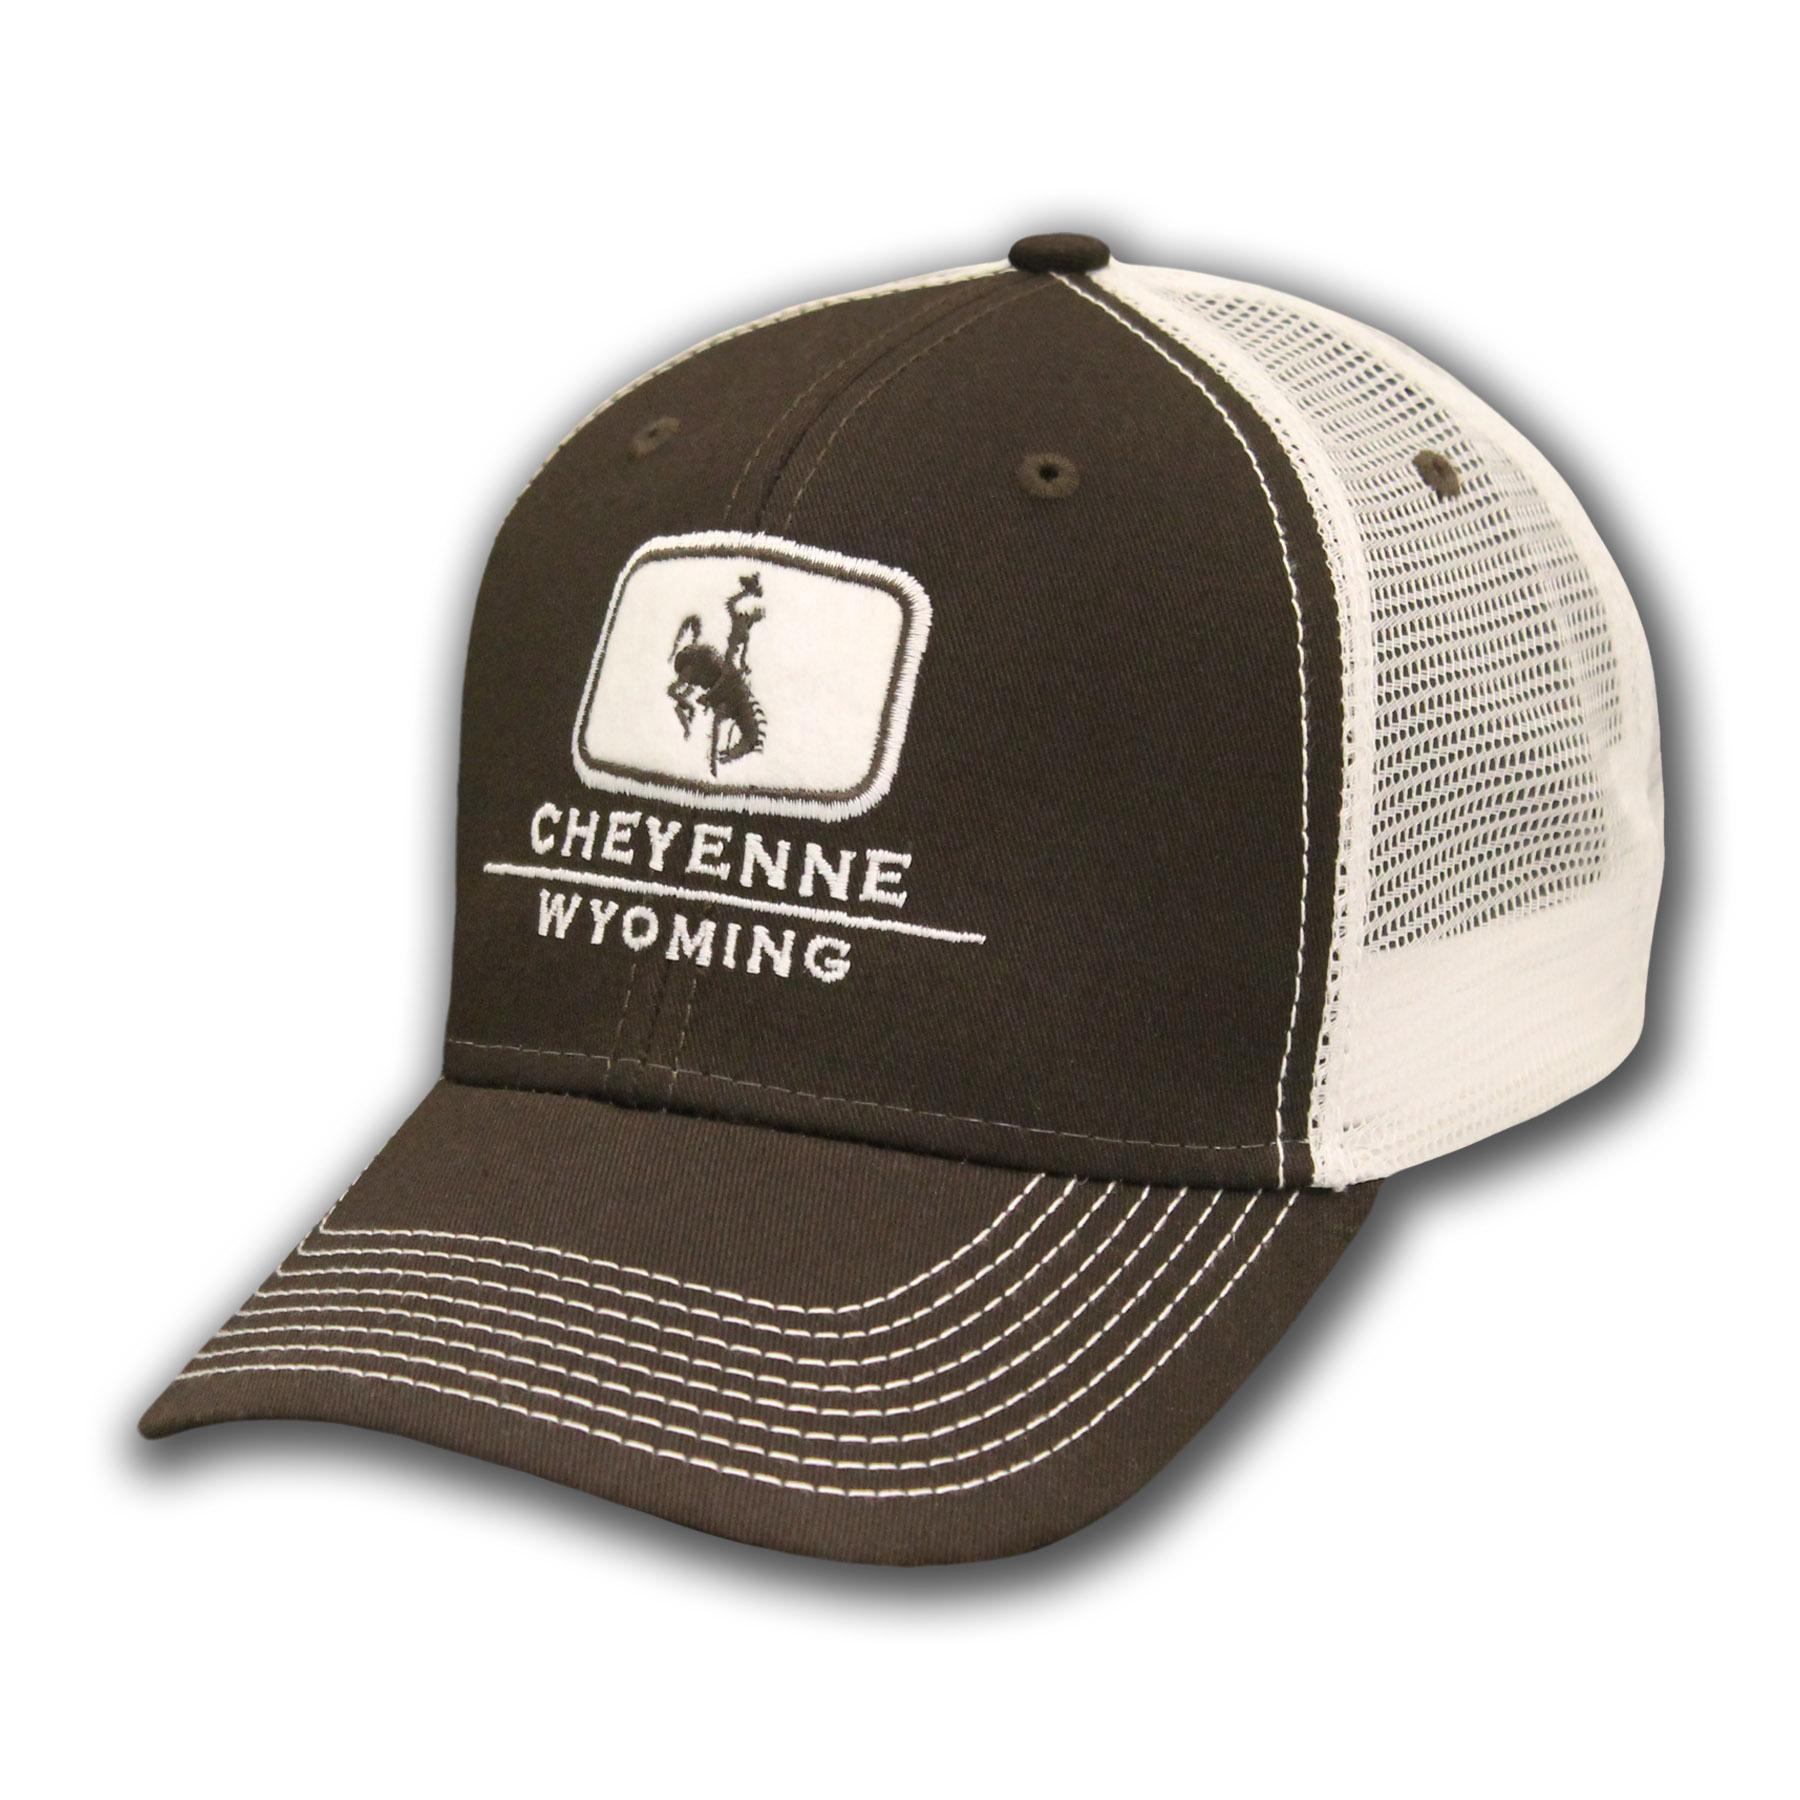 Cheyenne Wyoming Sideline Hat